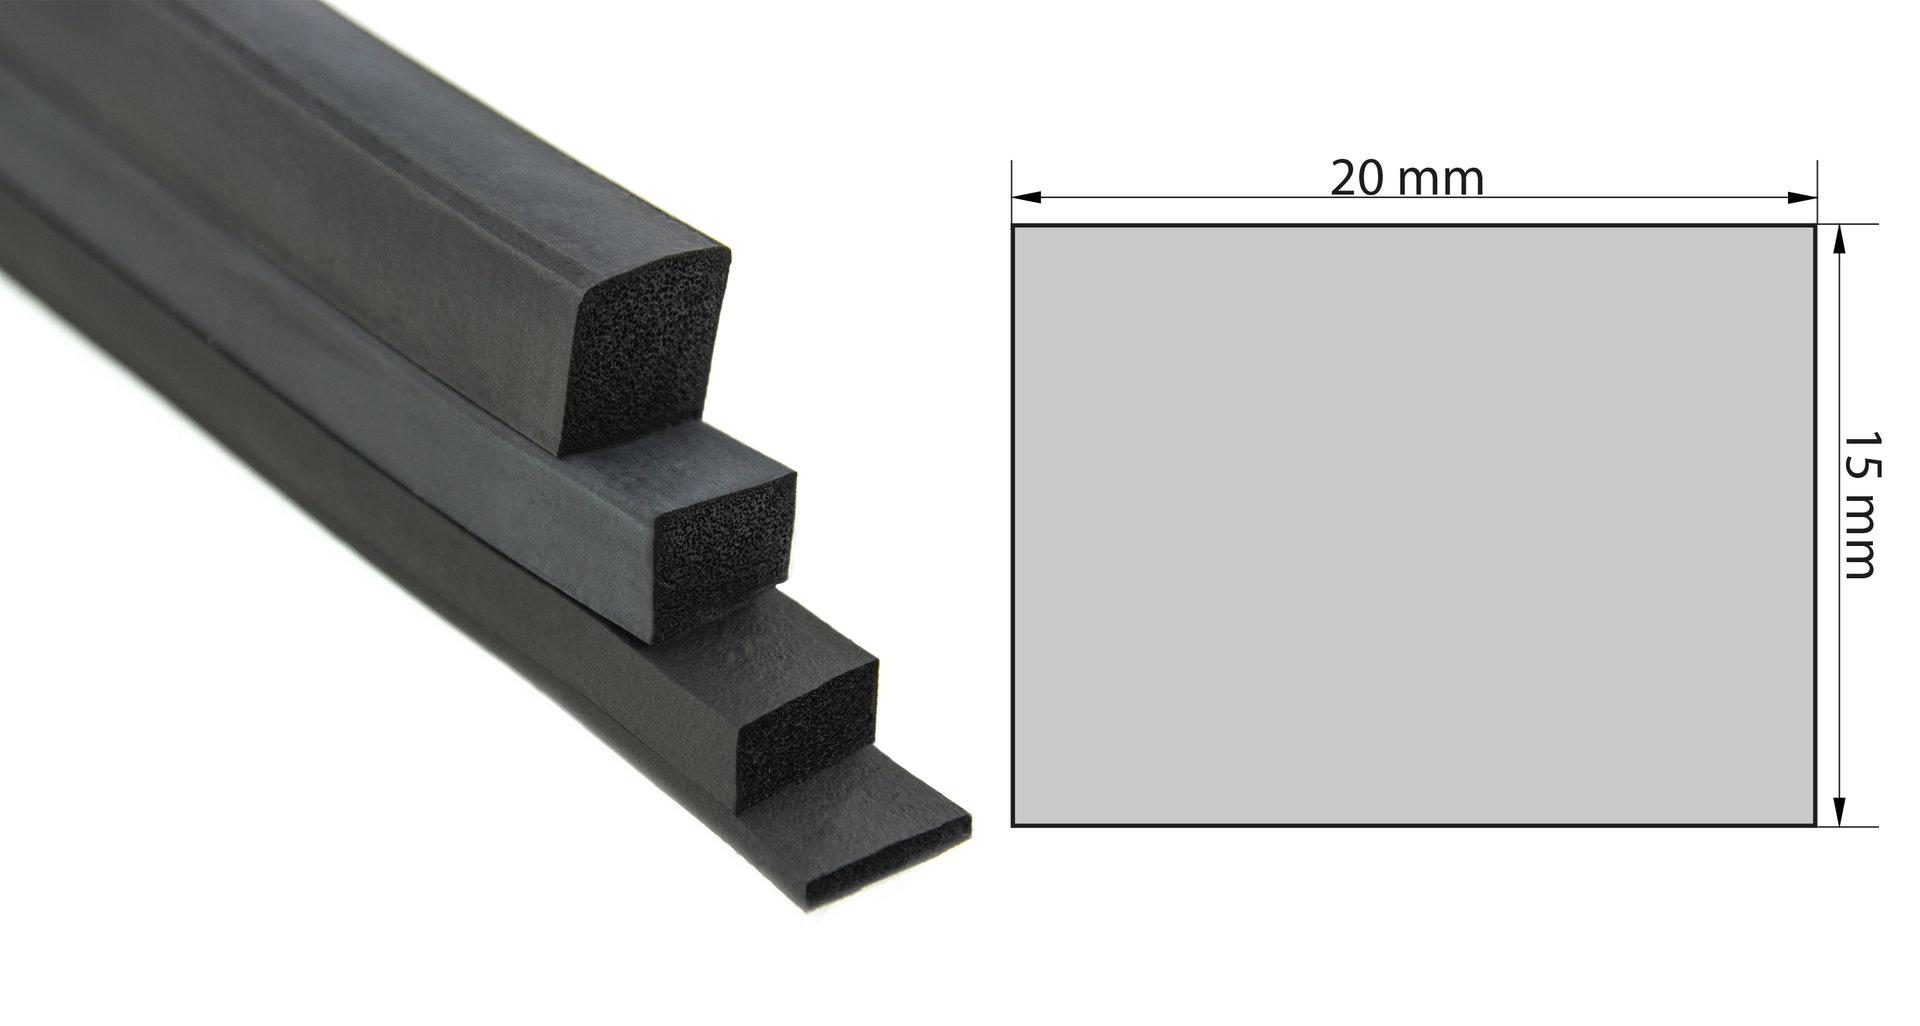 Rechteck Moosgummi Dichtung selbstklebend 3x20 mm 20 mtr. € 2,33// m